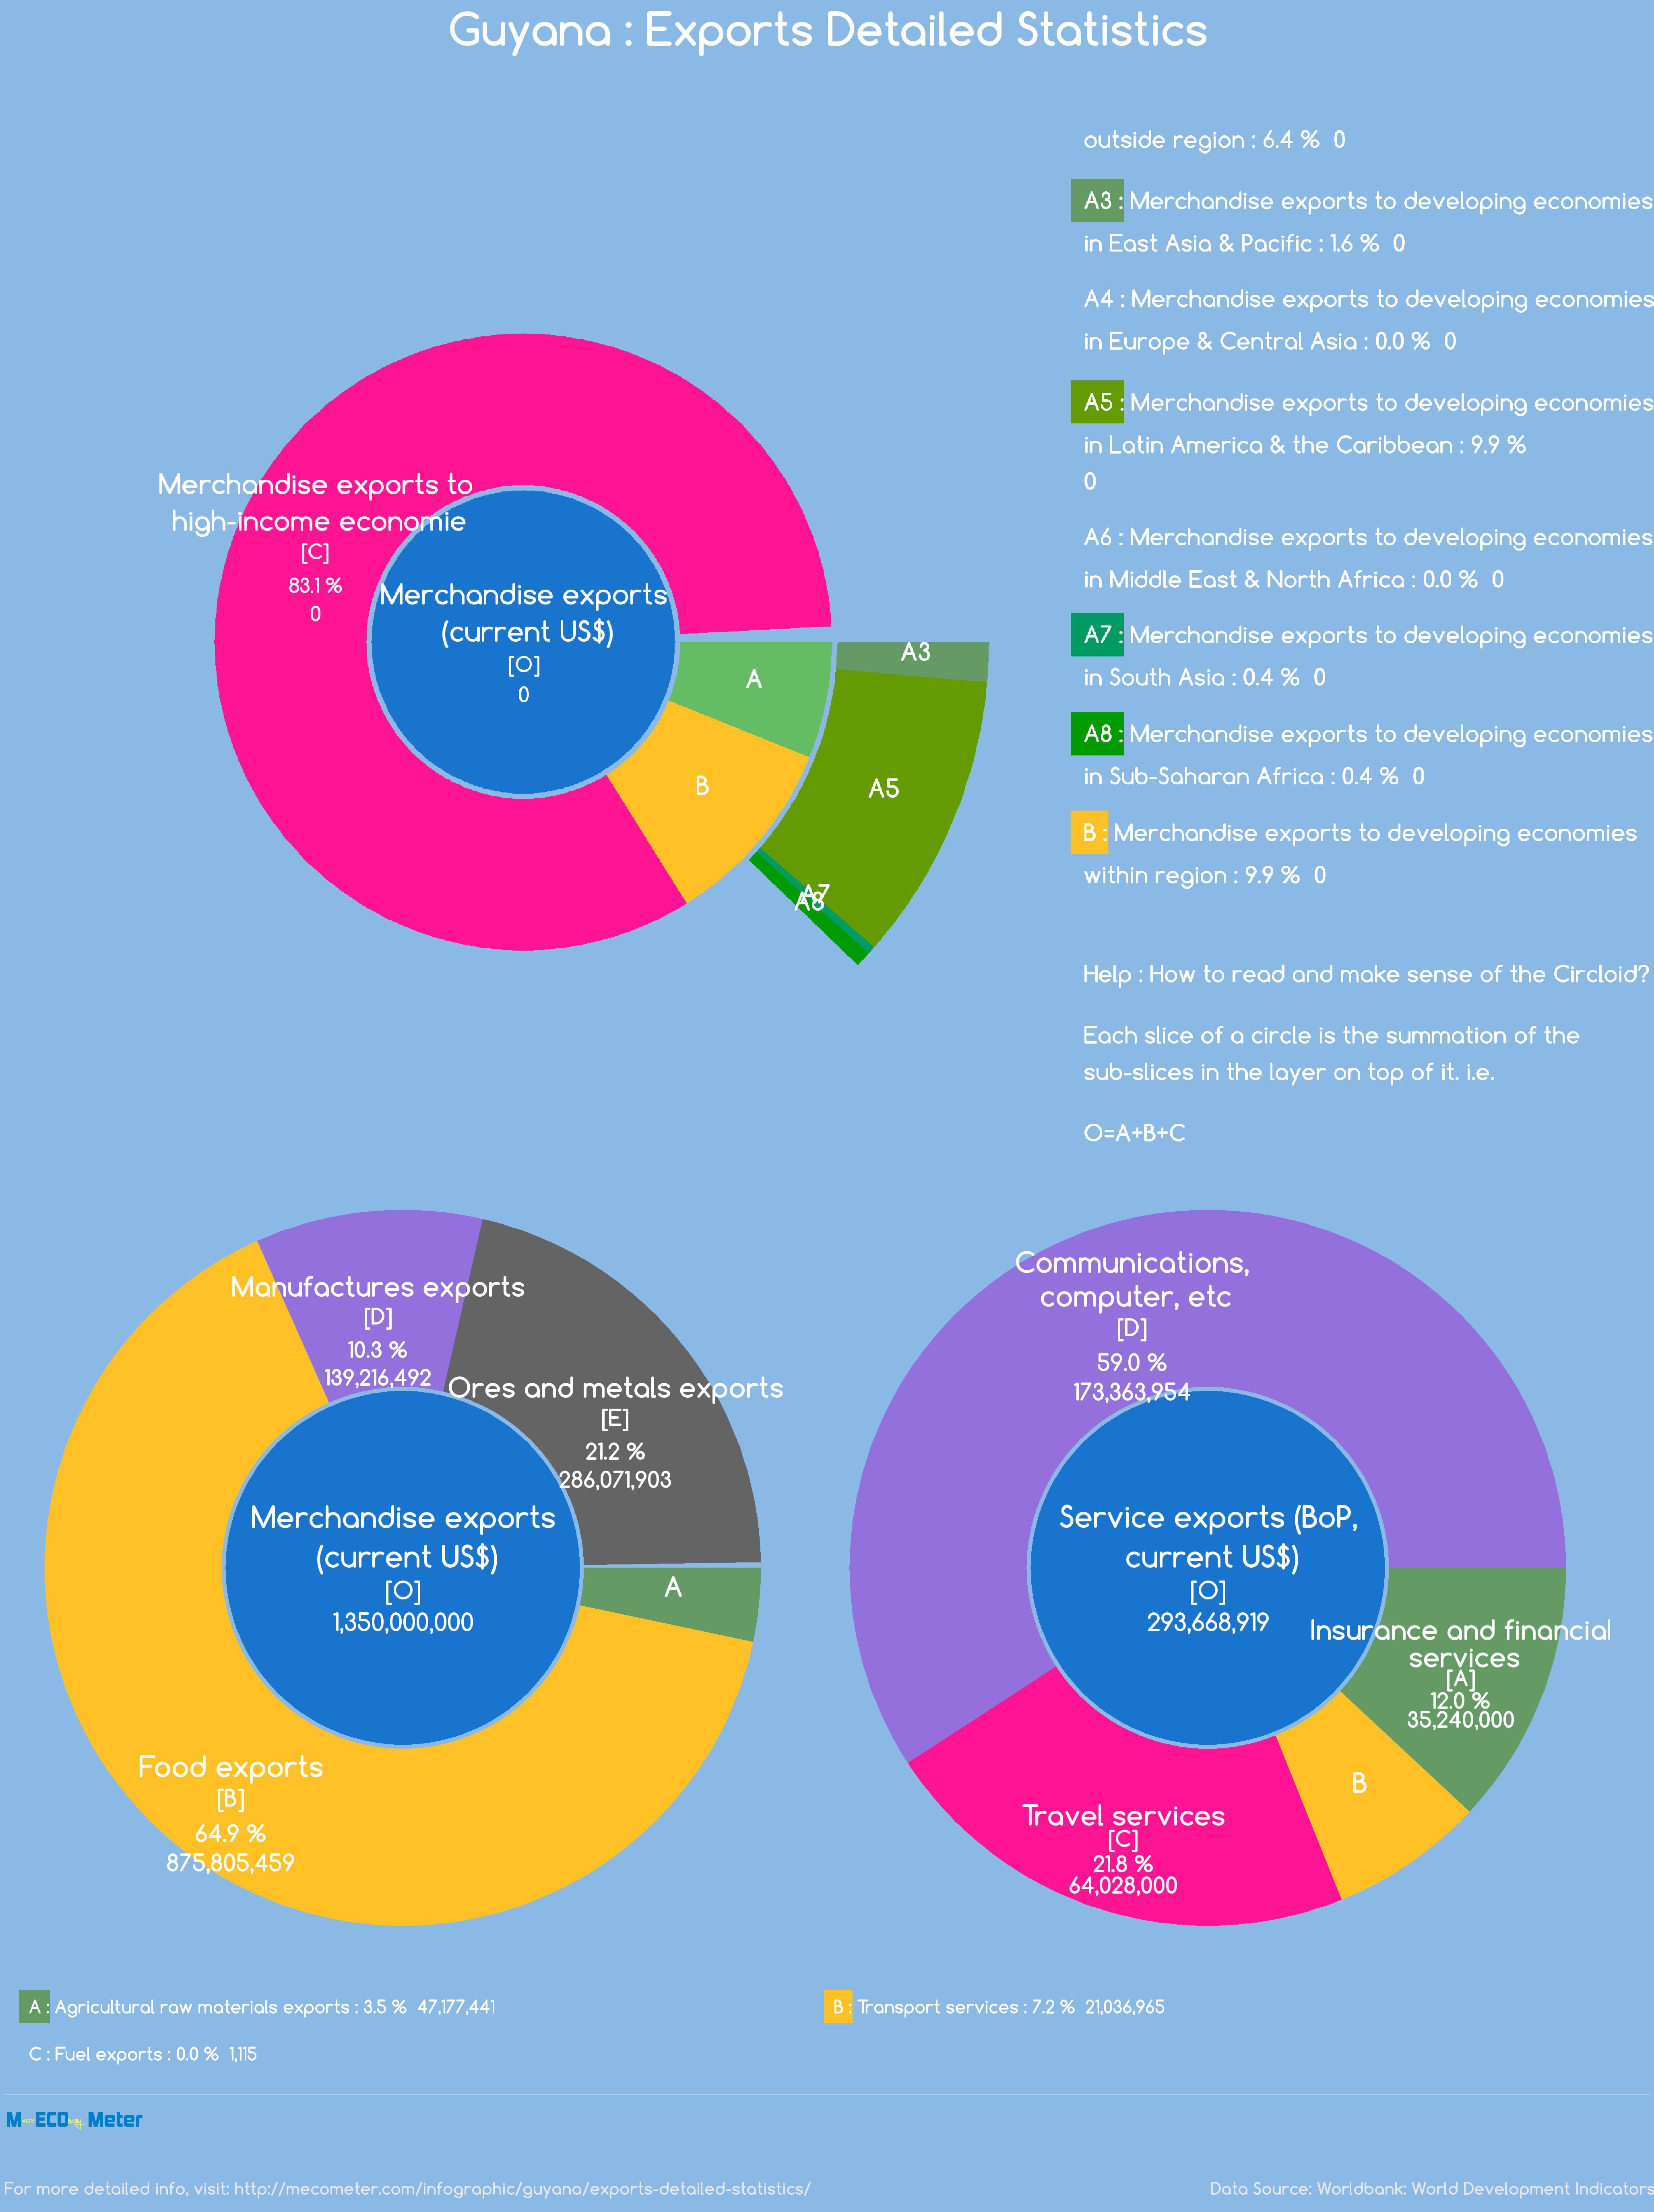 Guyana : Exports Detailed Statistics